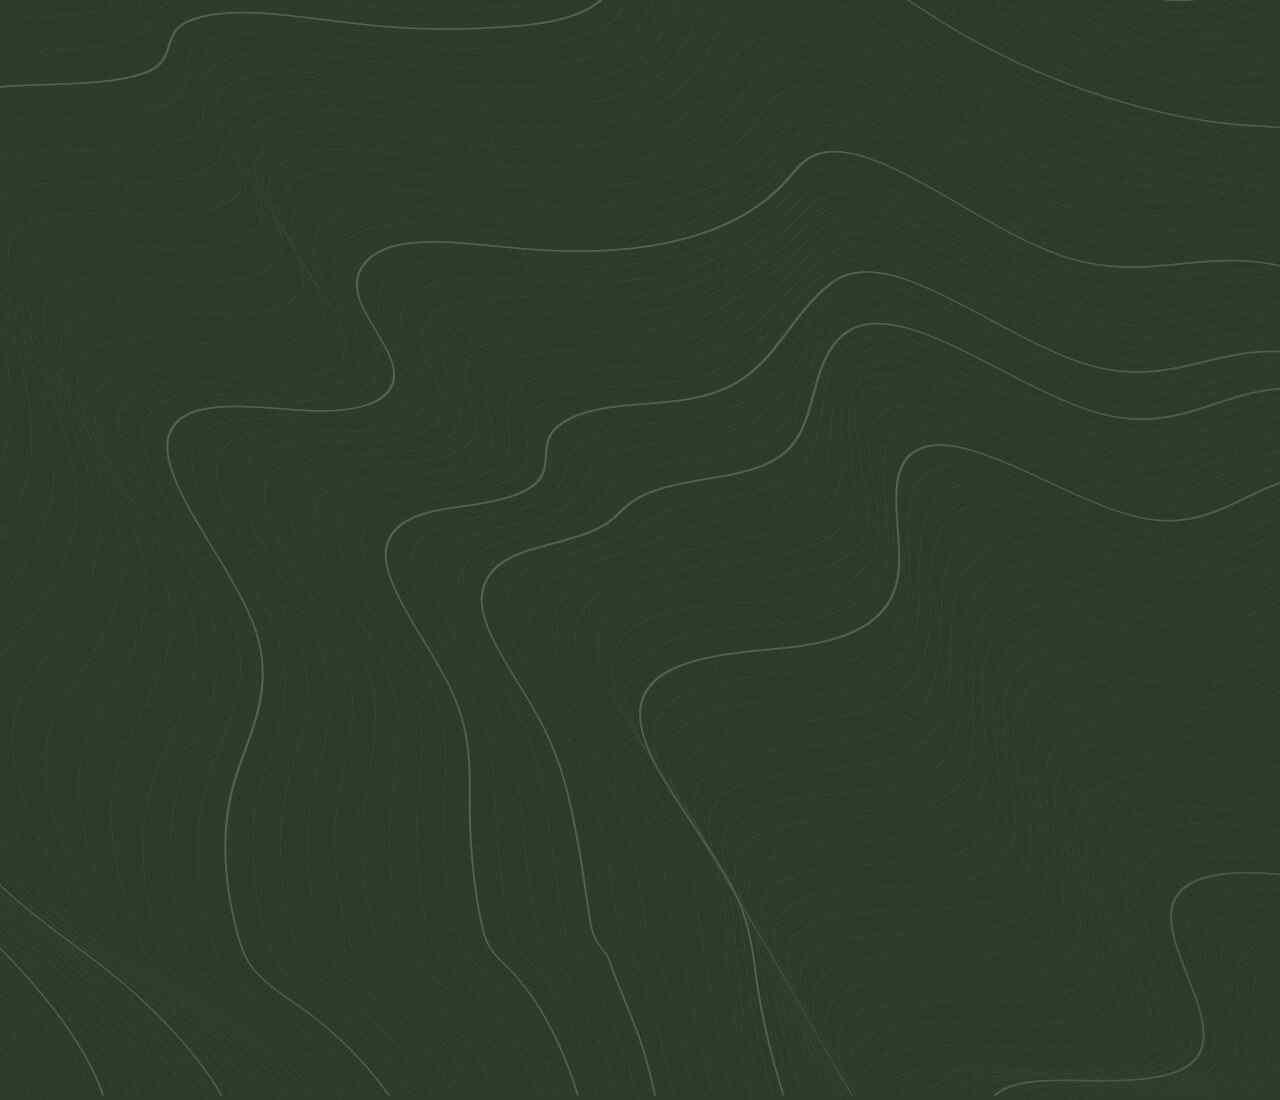 https://i2.wp.com/nepremicnine-lanel.net/wp-content/uploads/2020/02/green-background.jpg?resize=1280%2C1100&ssl=1